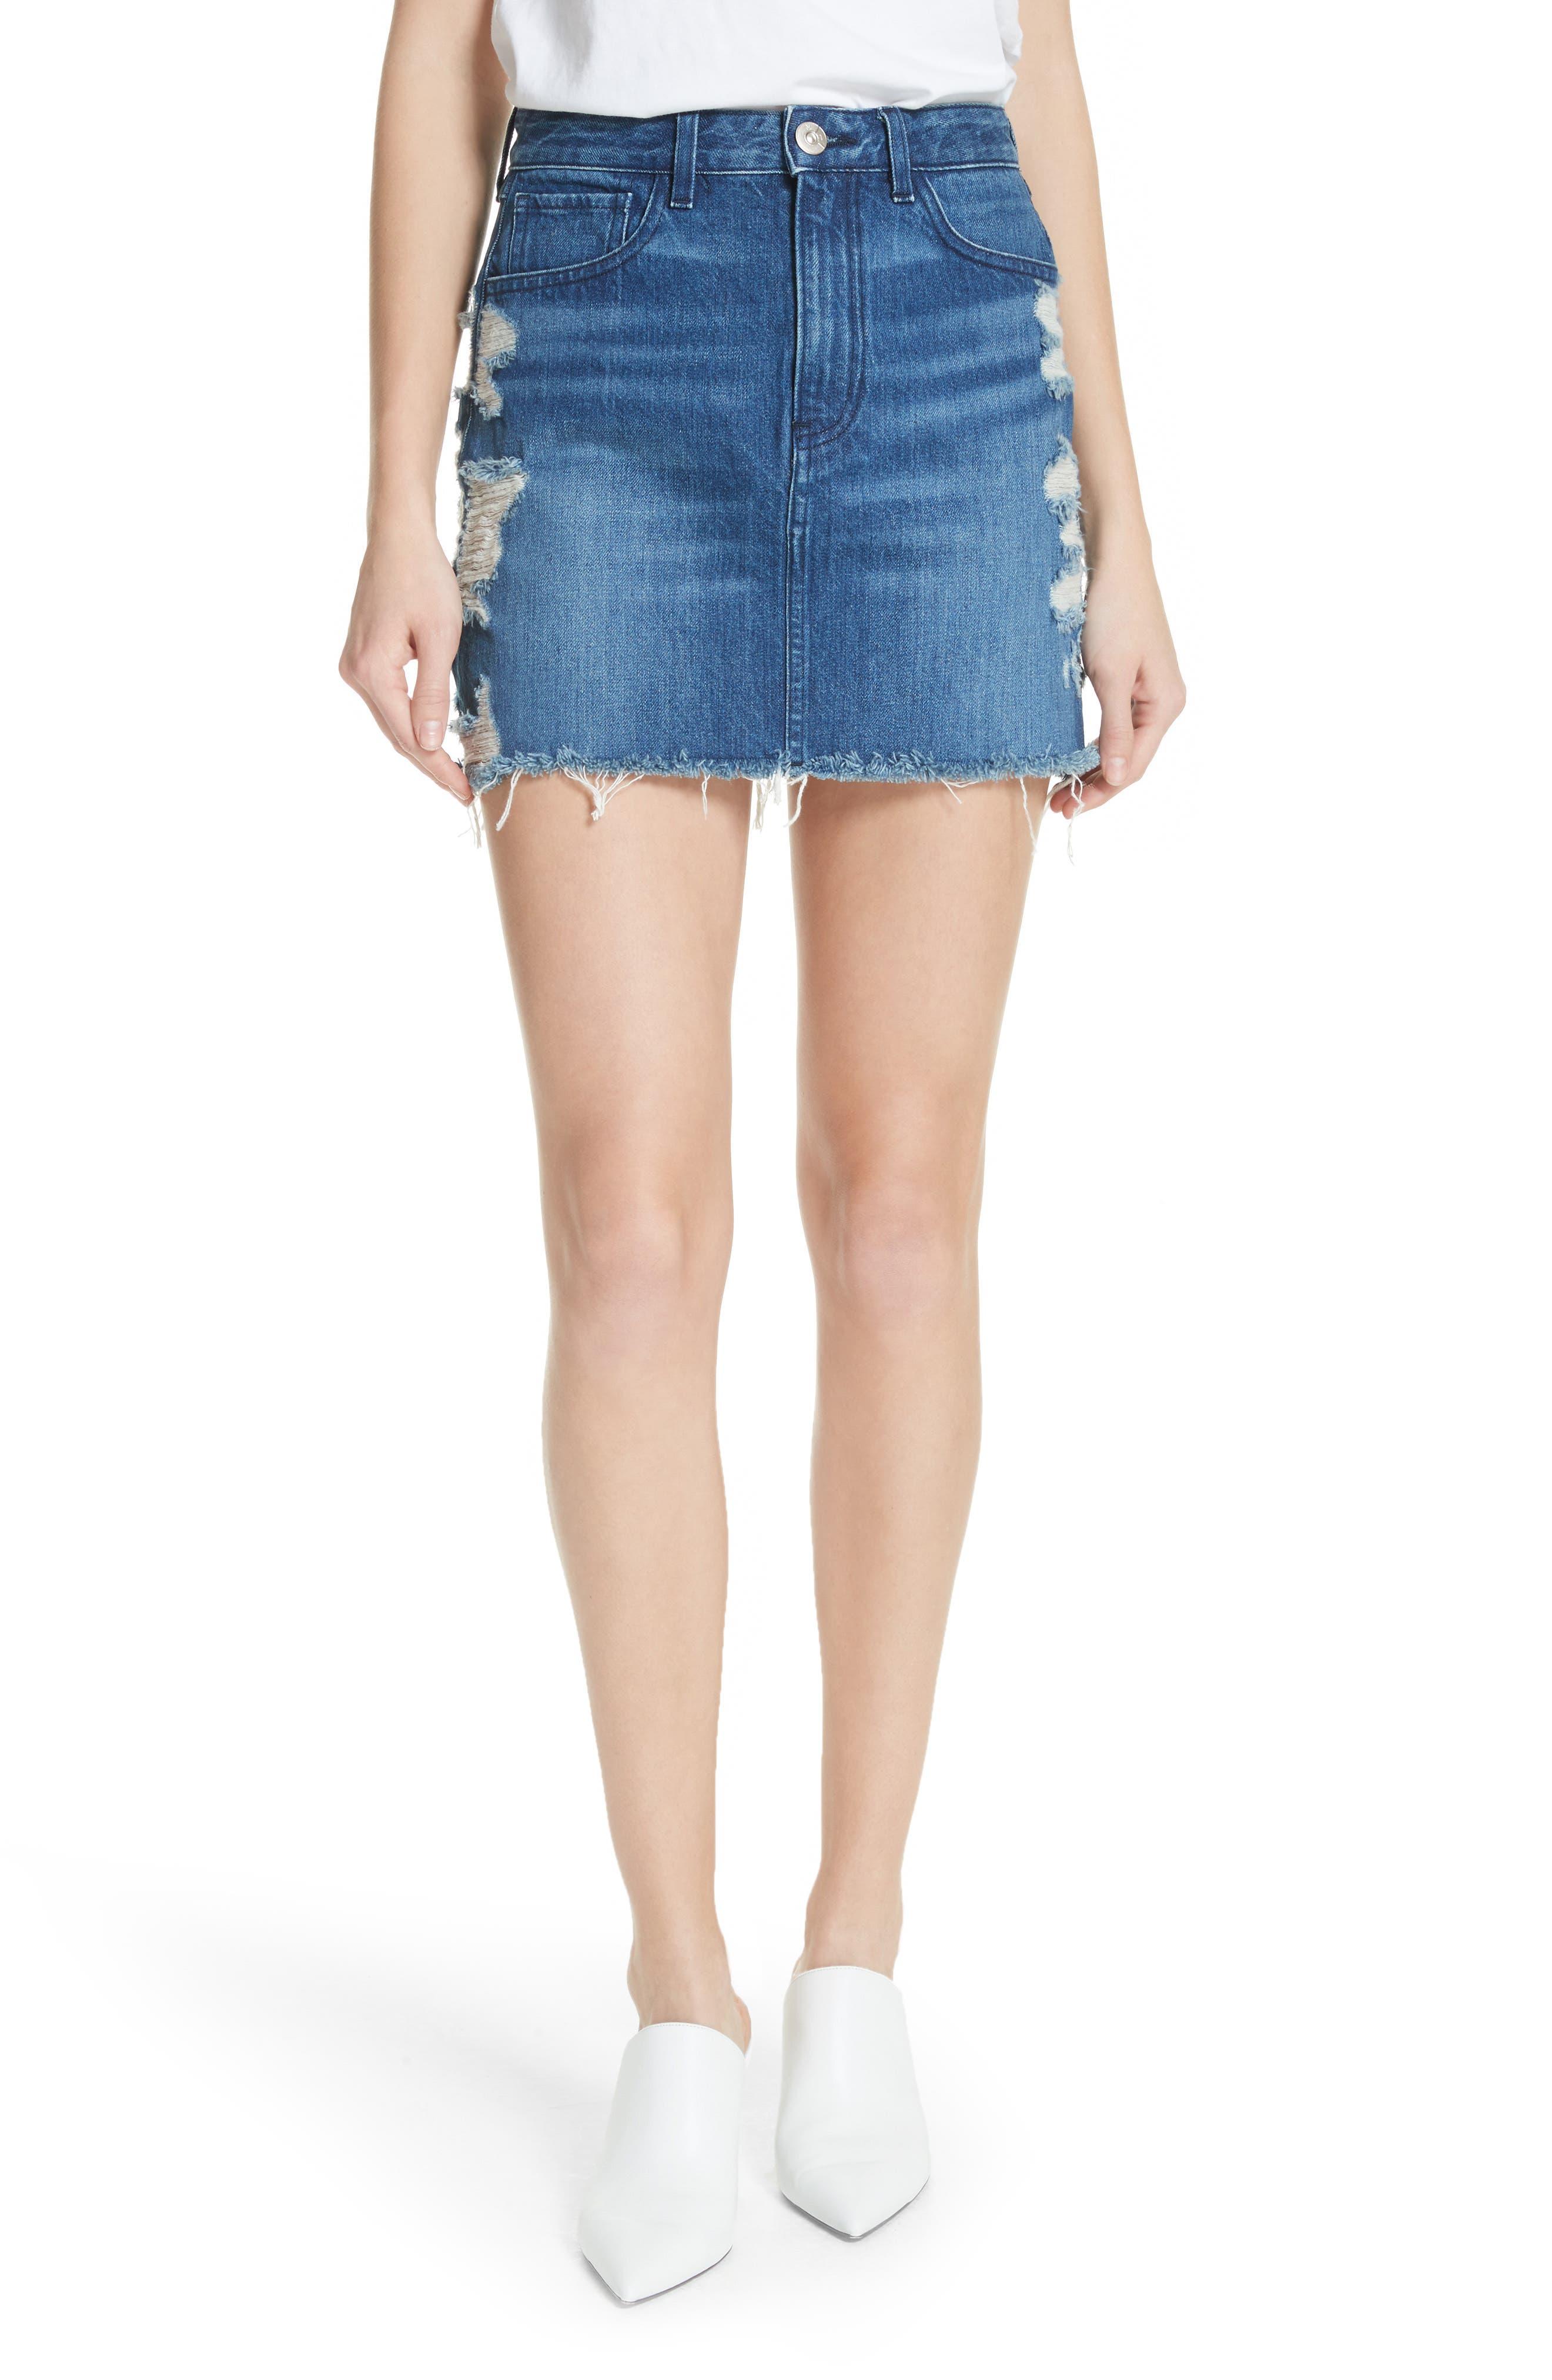 Celine Distressed Denim Skirt,                         Main,                         color, Lela